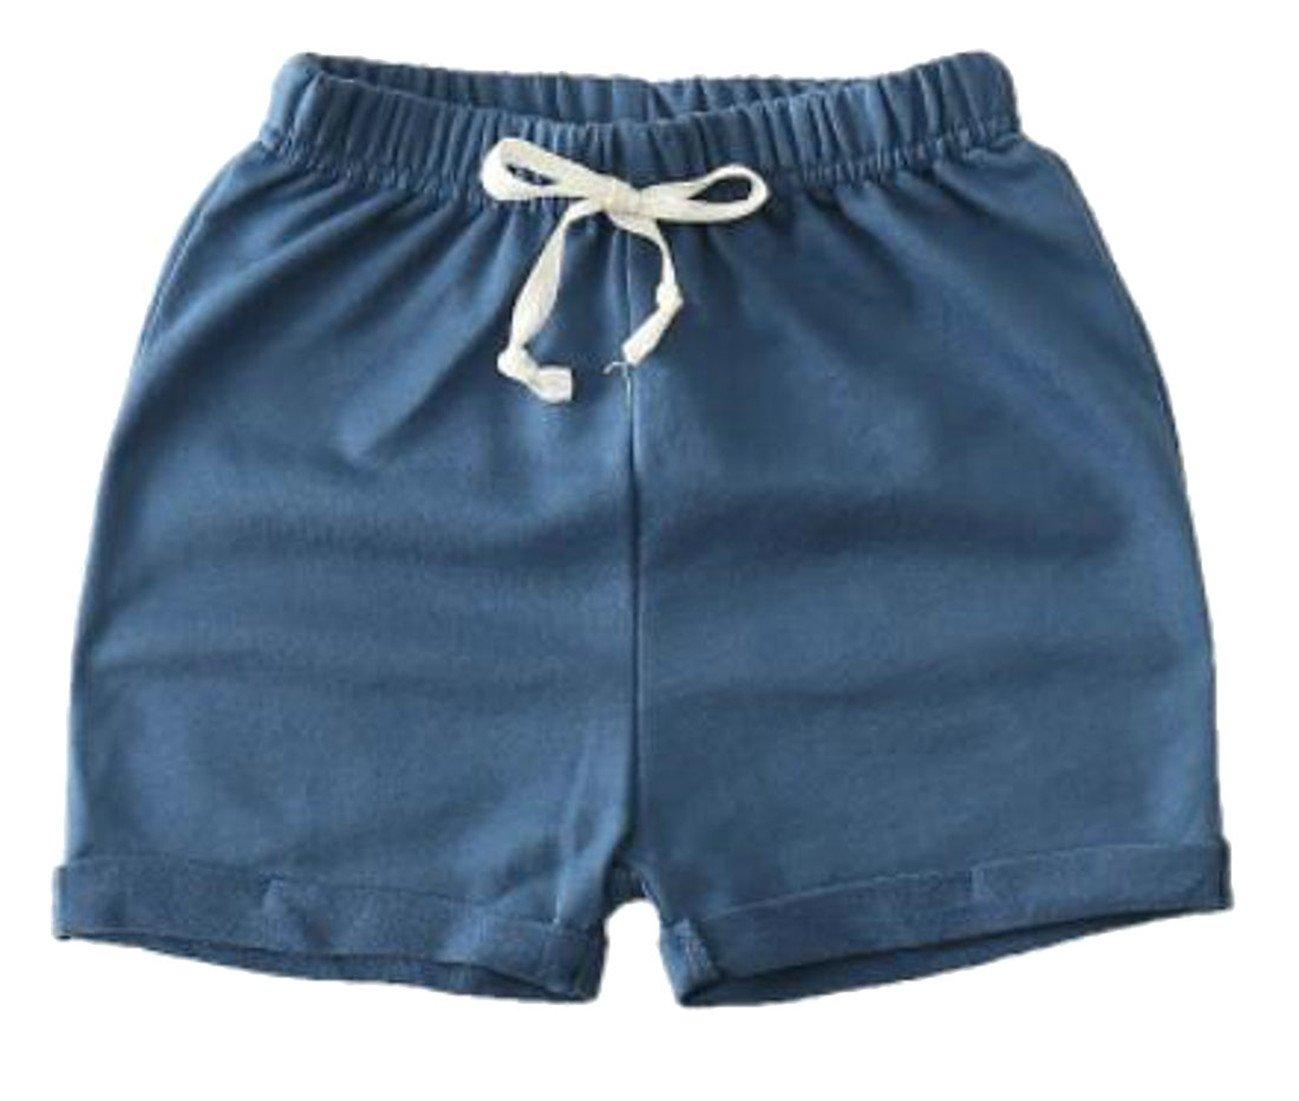 Cromoncent Boys Girls Cotton Elastic Waist Drawstring Cuffed Solid Thin Shorts Dark Blue 7/8